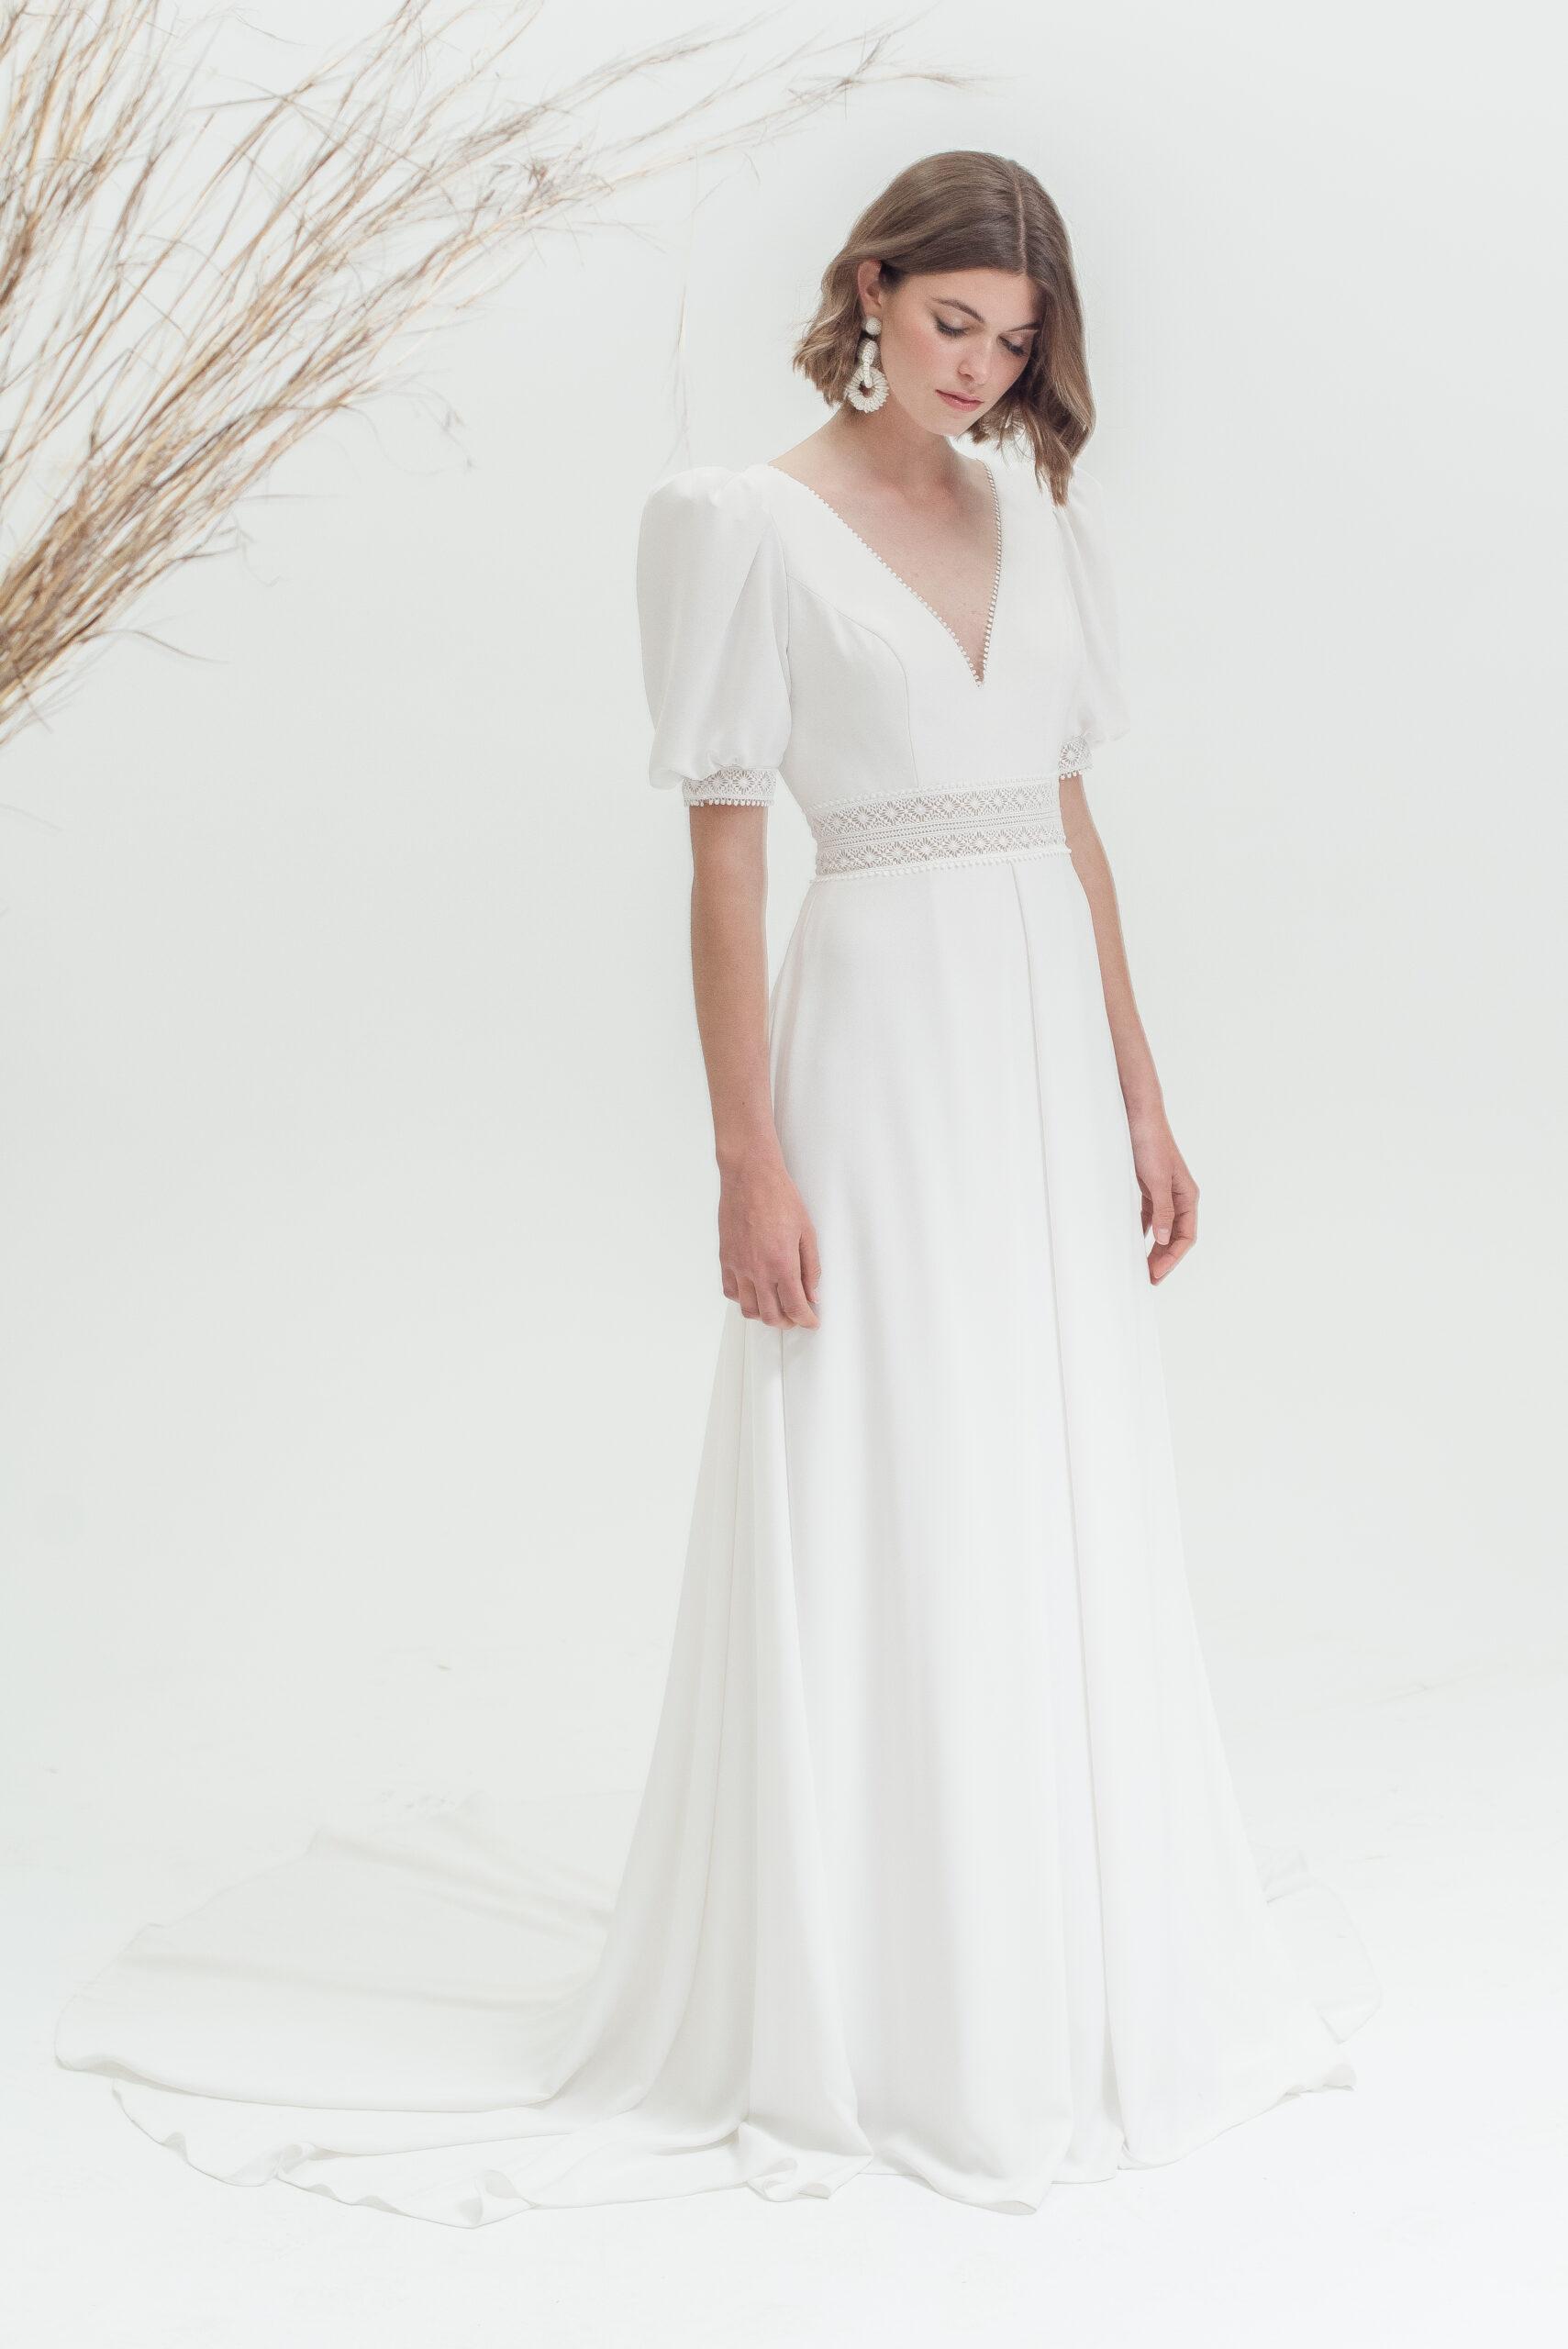 Fara sposa coleccion 2022 essencia novias modelo adara